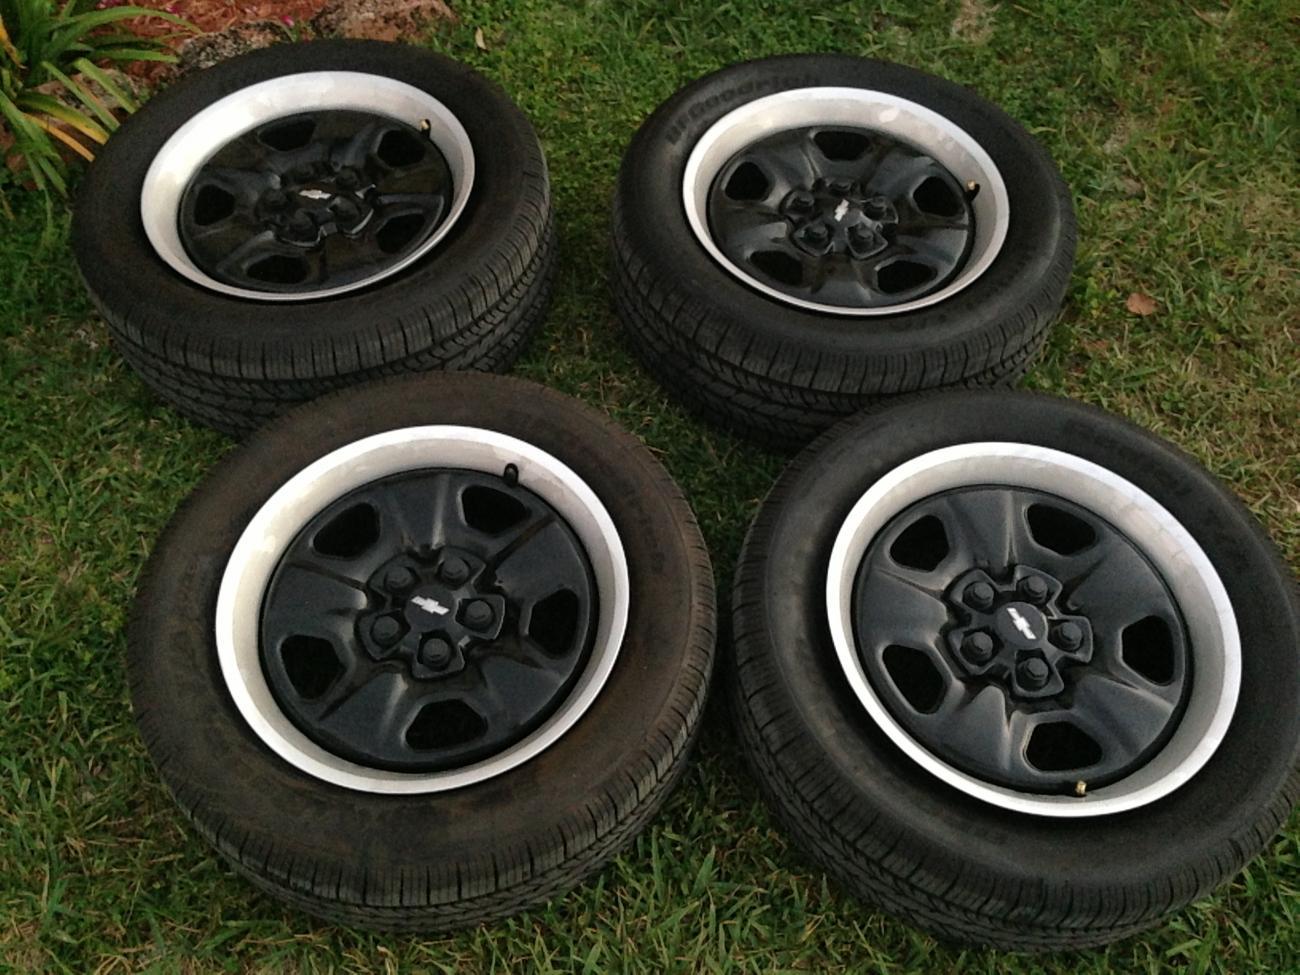 Camaro Rally Wheels And Polished Oem Rims Camaro5 Chevy